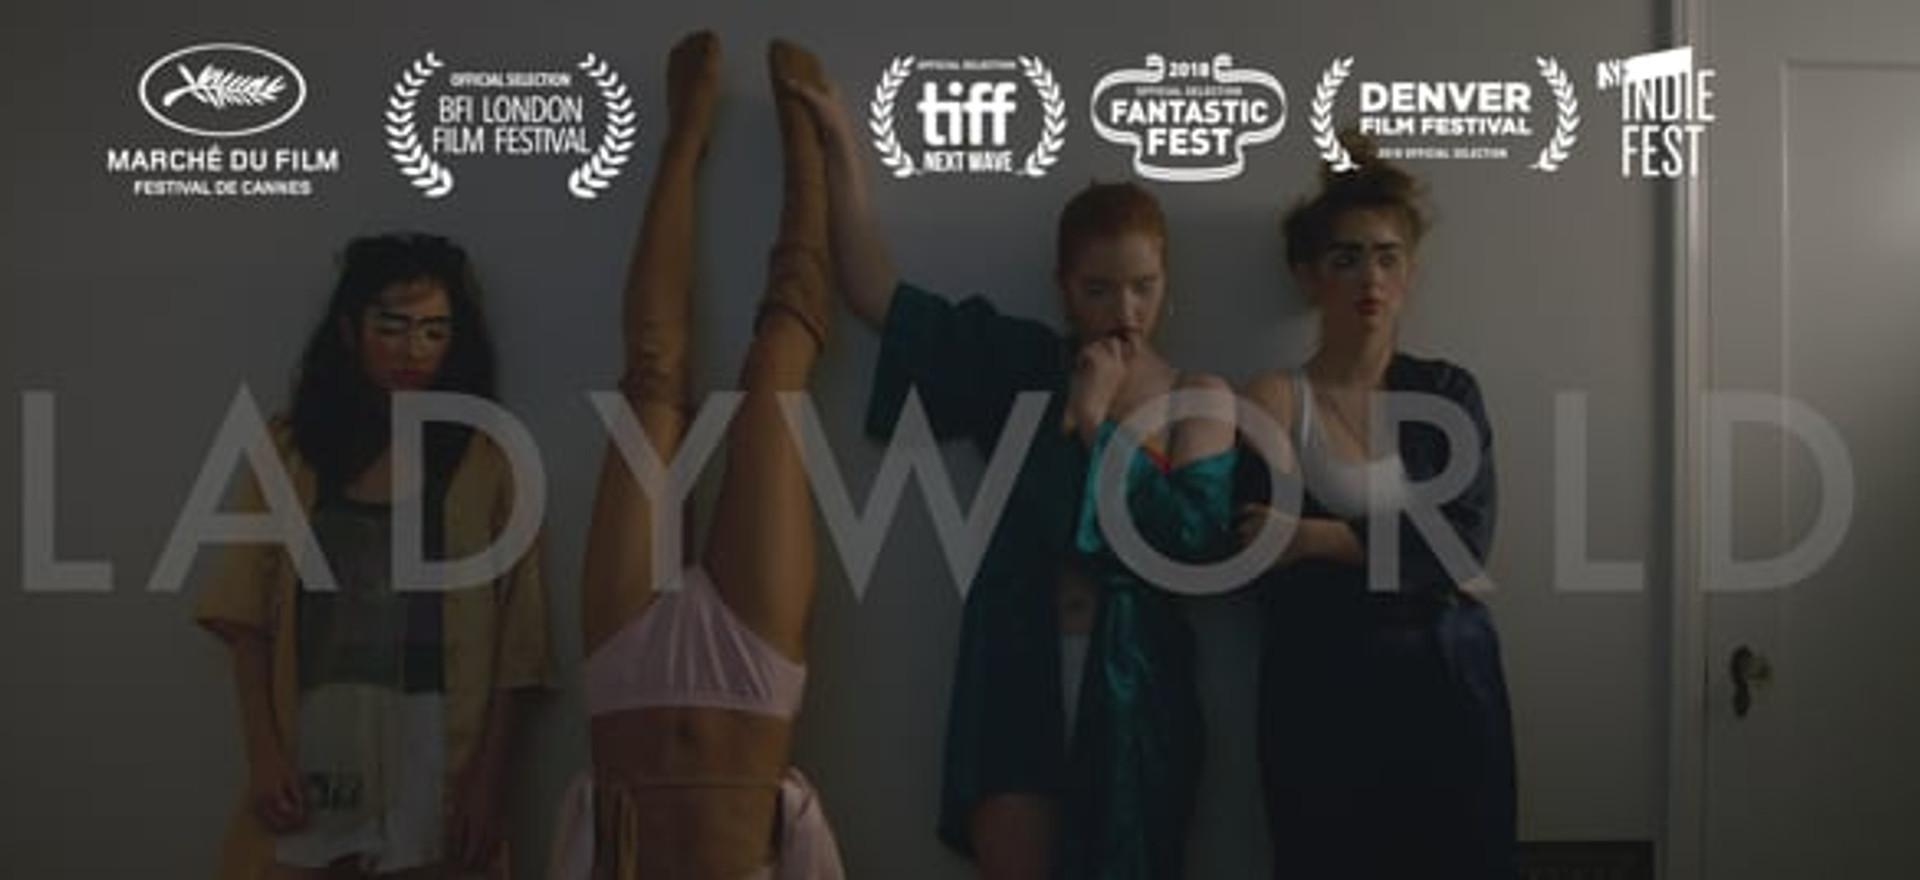 Ladyworld Trailer